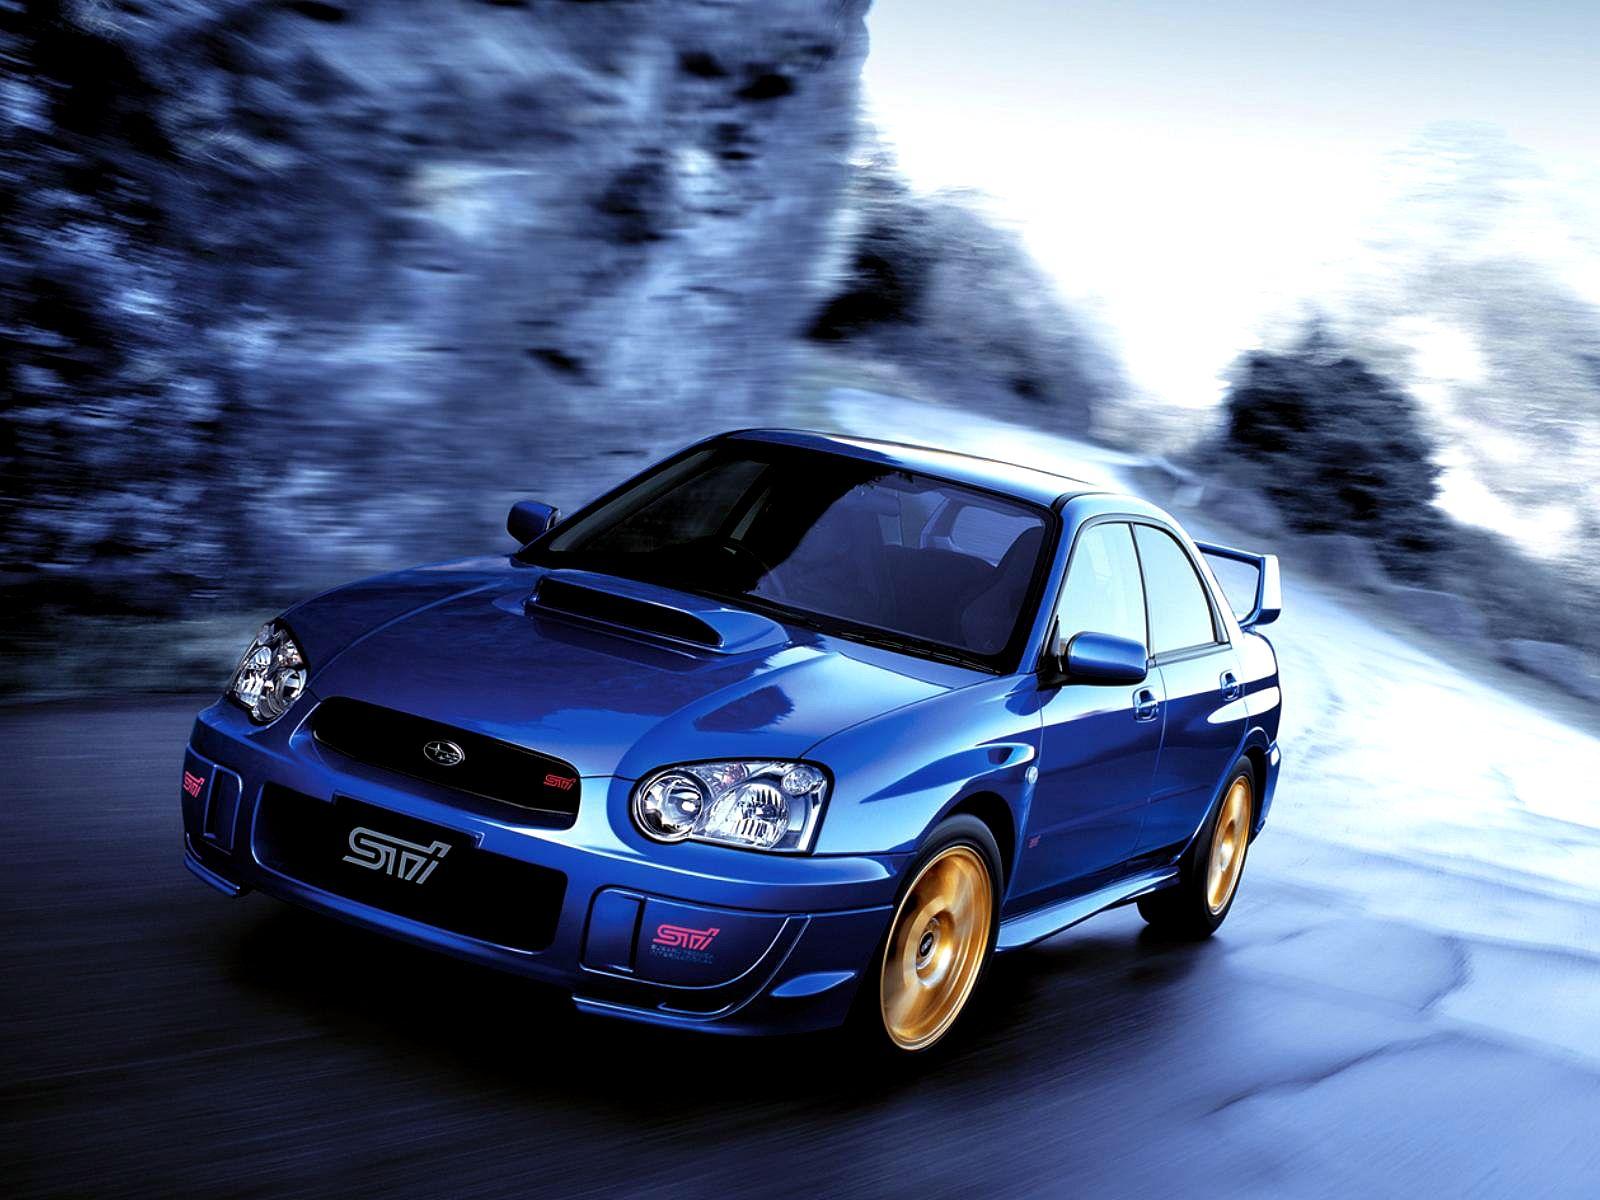 Subaru Impreza WRX Sti 2004. Res: 1600x1200 / Size:203kb. Views: 85660